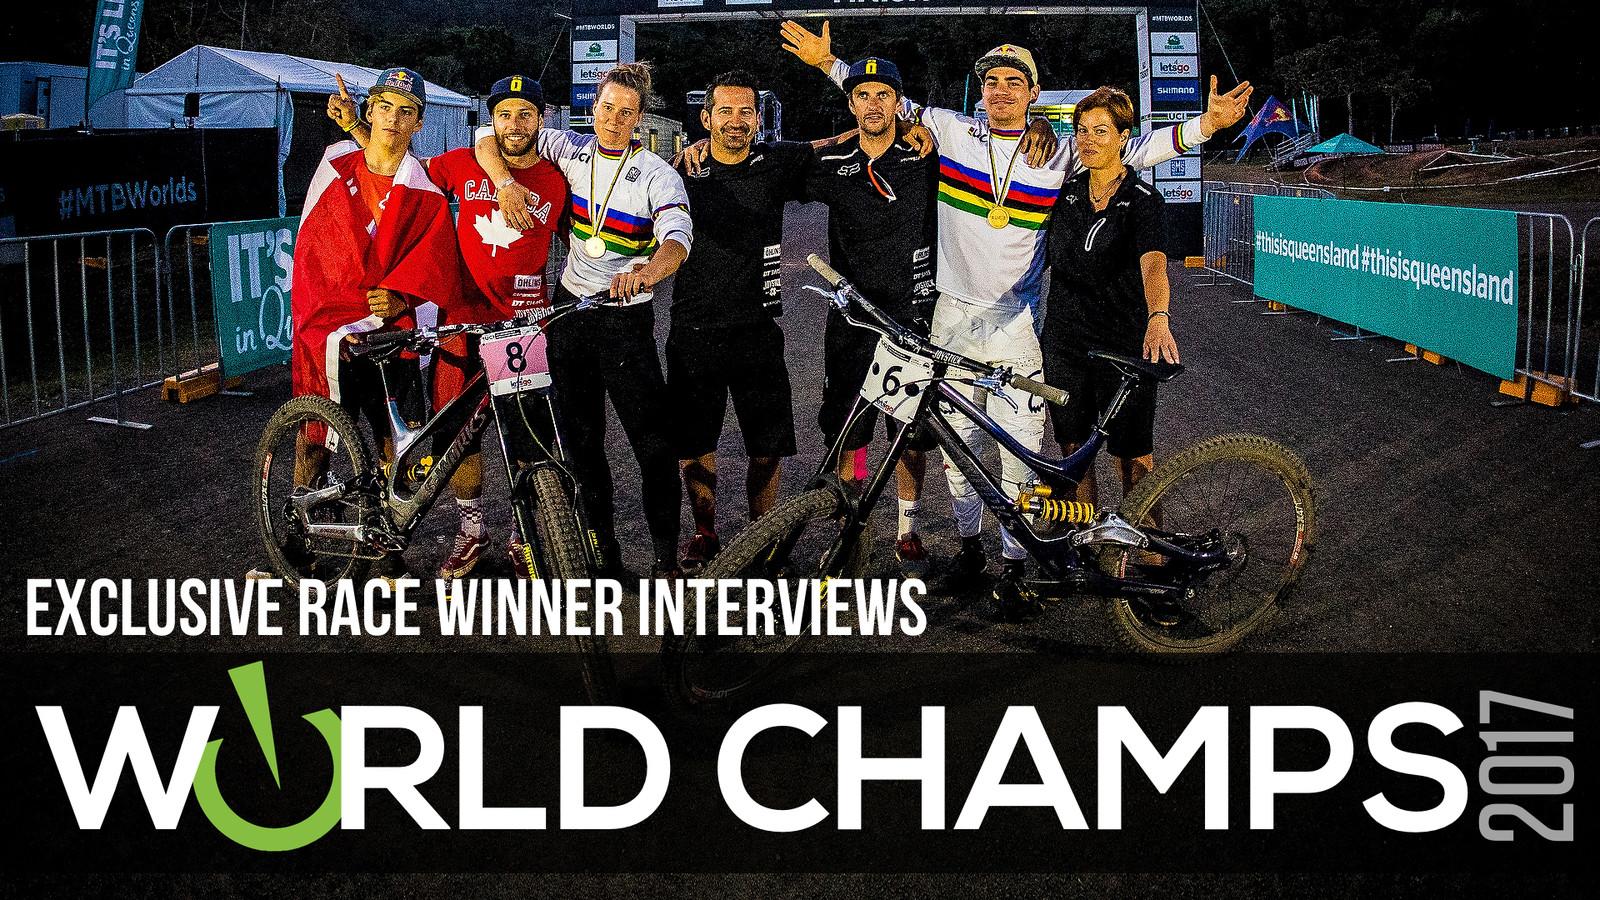 Exclusive 2017 DH World Champion Interviews